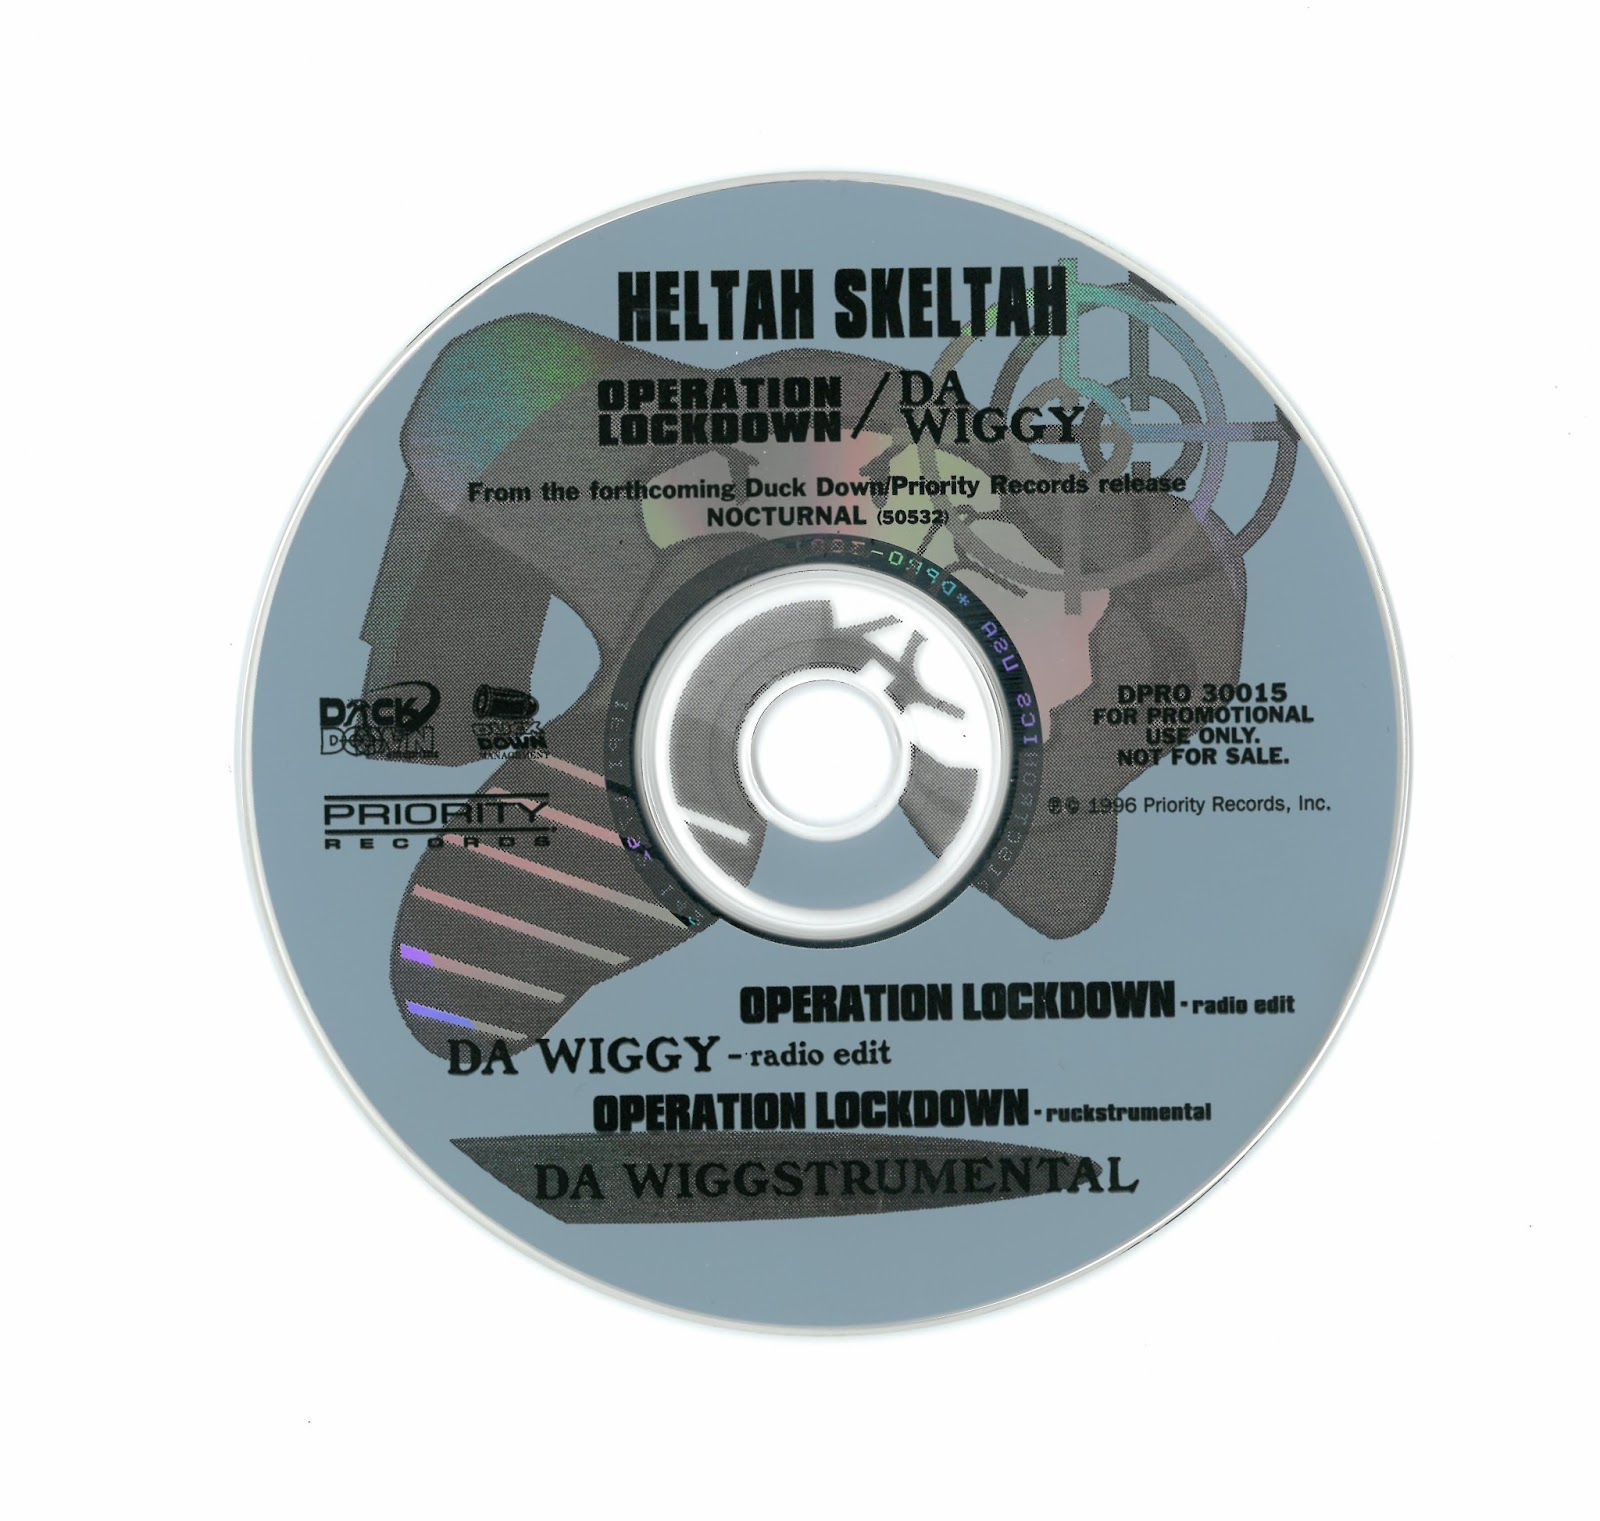 Heltah Skeltah – Operation Lockdown / Da Wiggy (Promo CDS) (1996) (320 kbps)